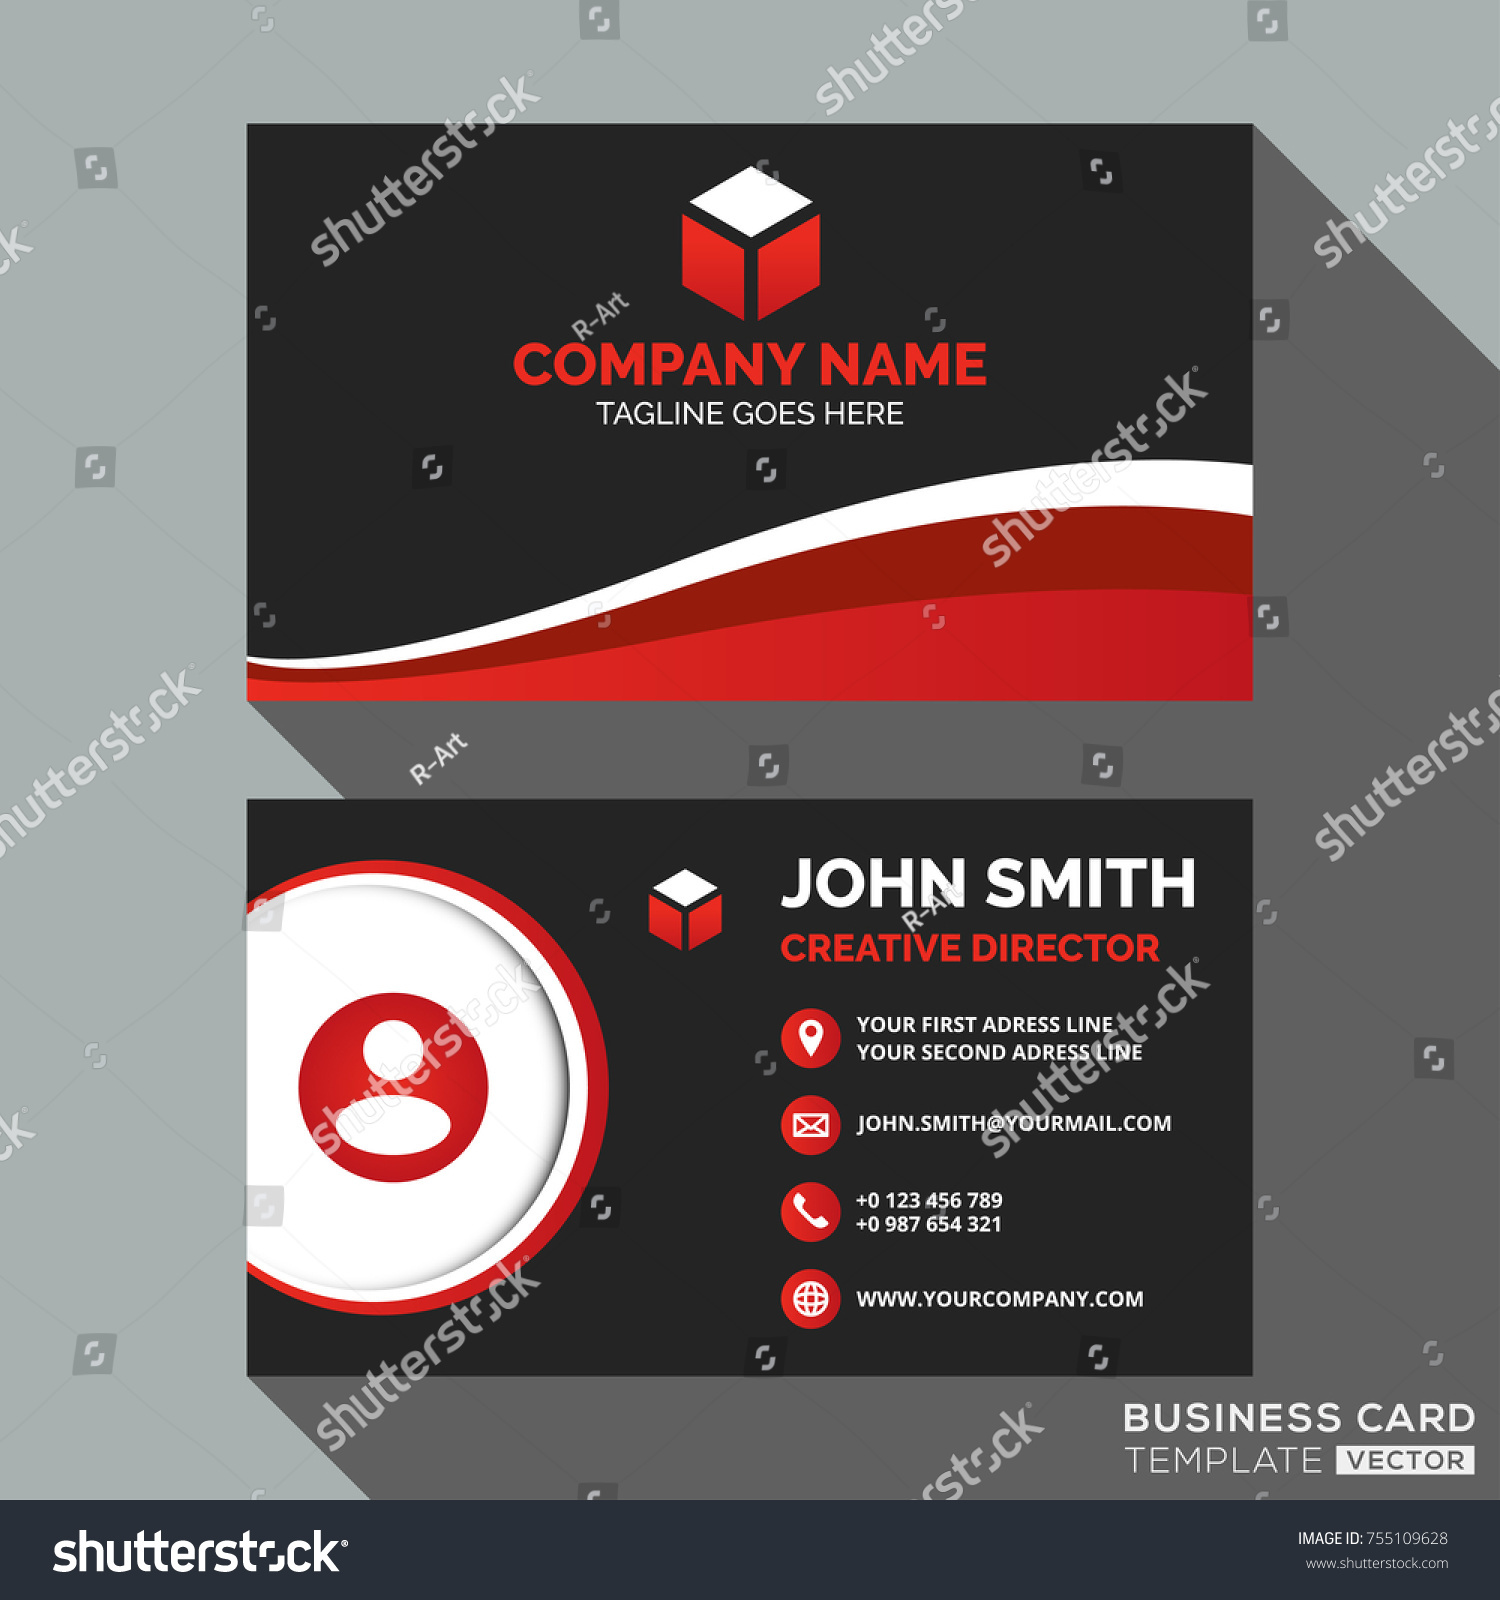 Dark red business card template design stock vector royalty free dark and red business card template design flashek Gallery